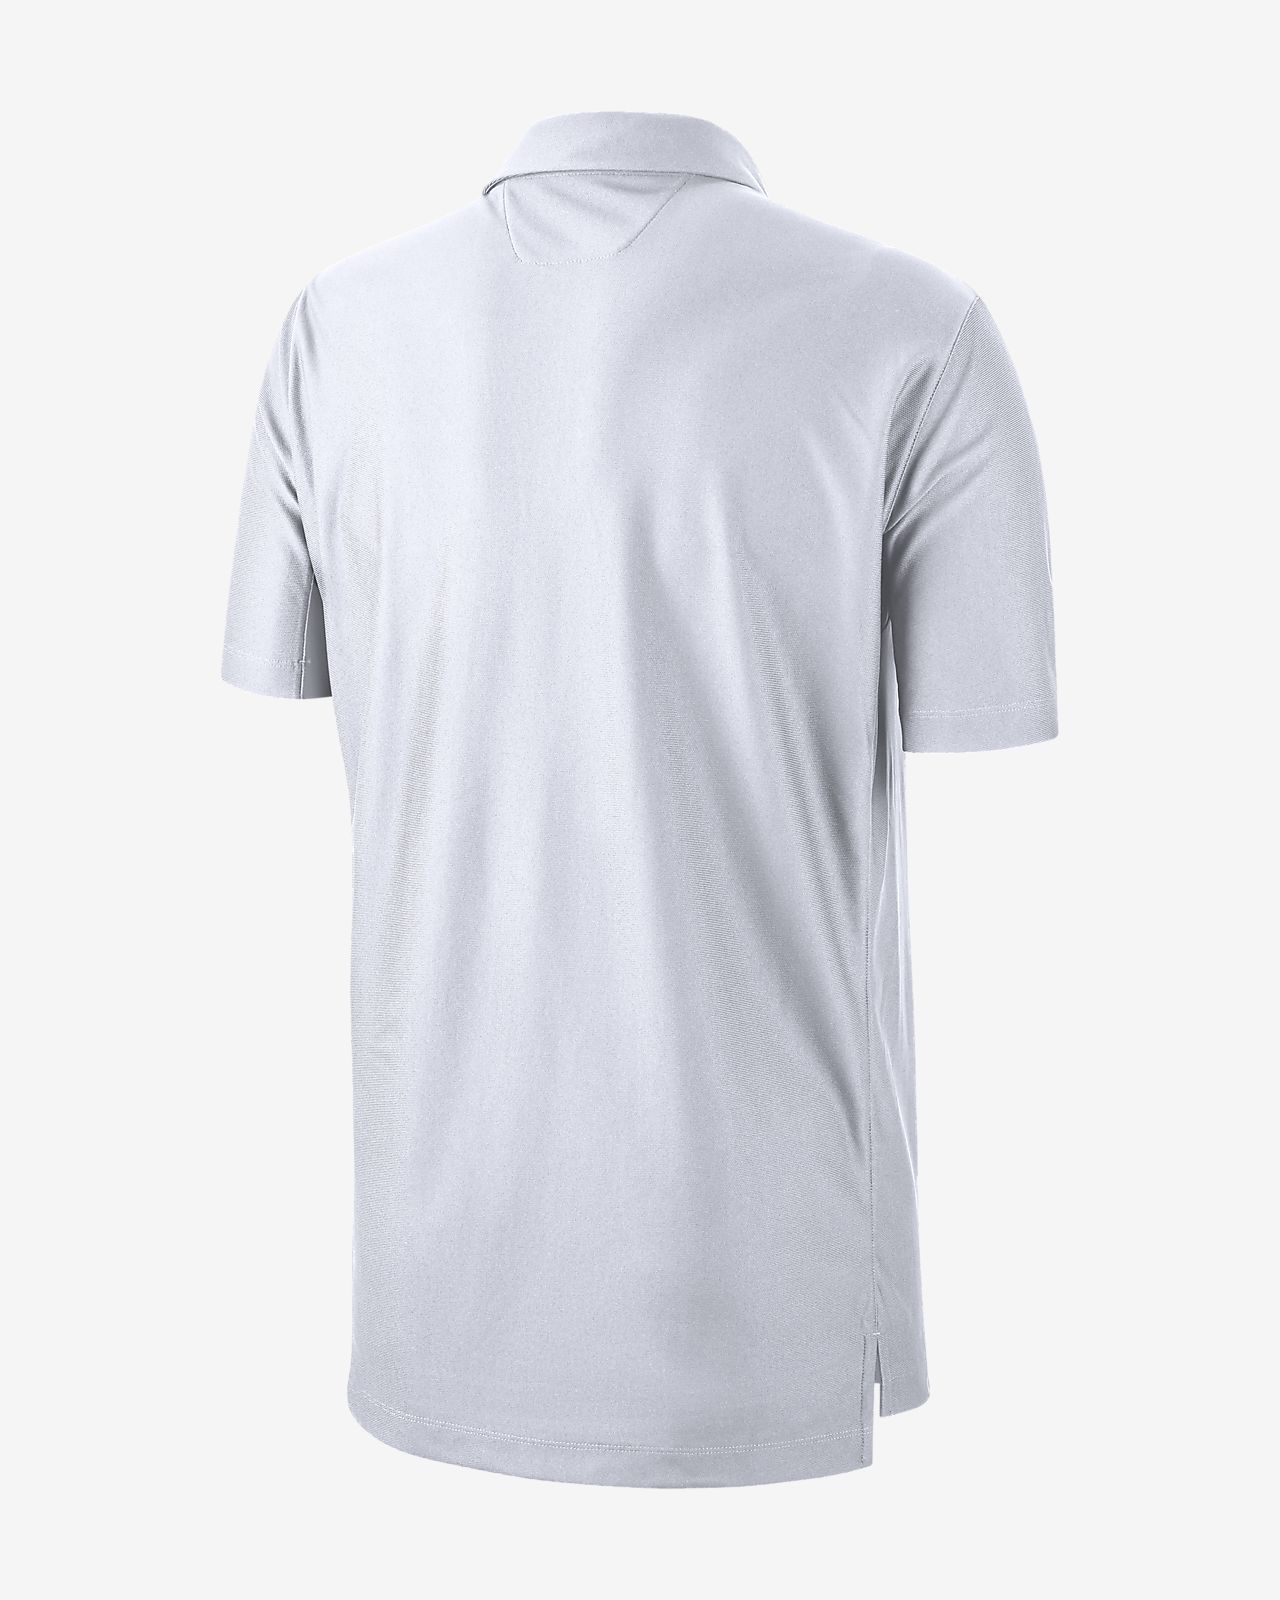 972fdeda Dri Fit Team Shirts - DREAMWORKS